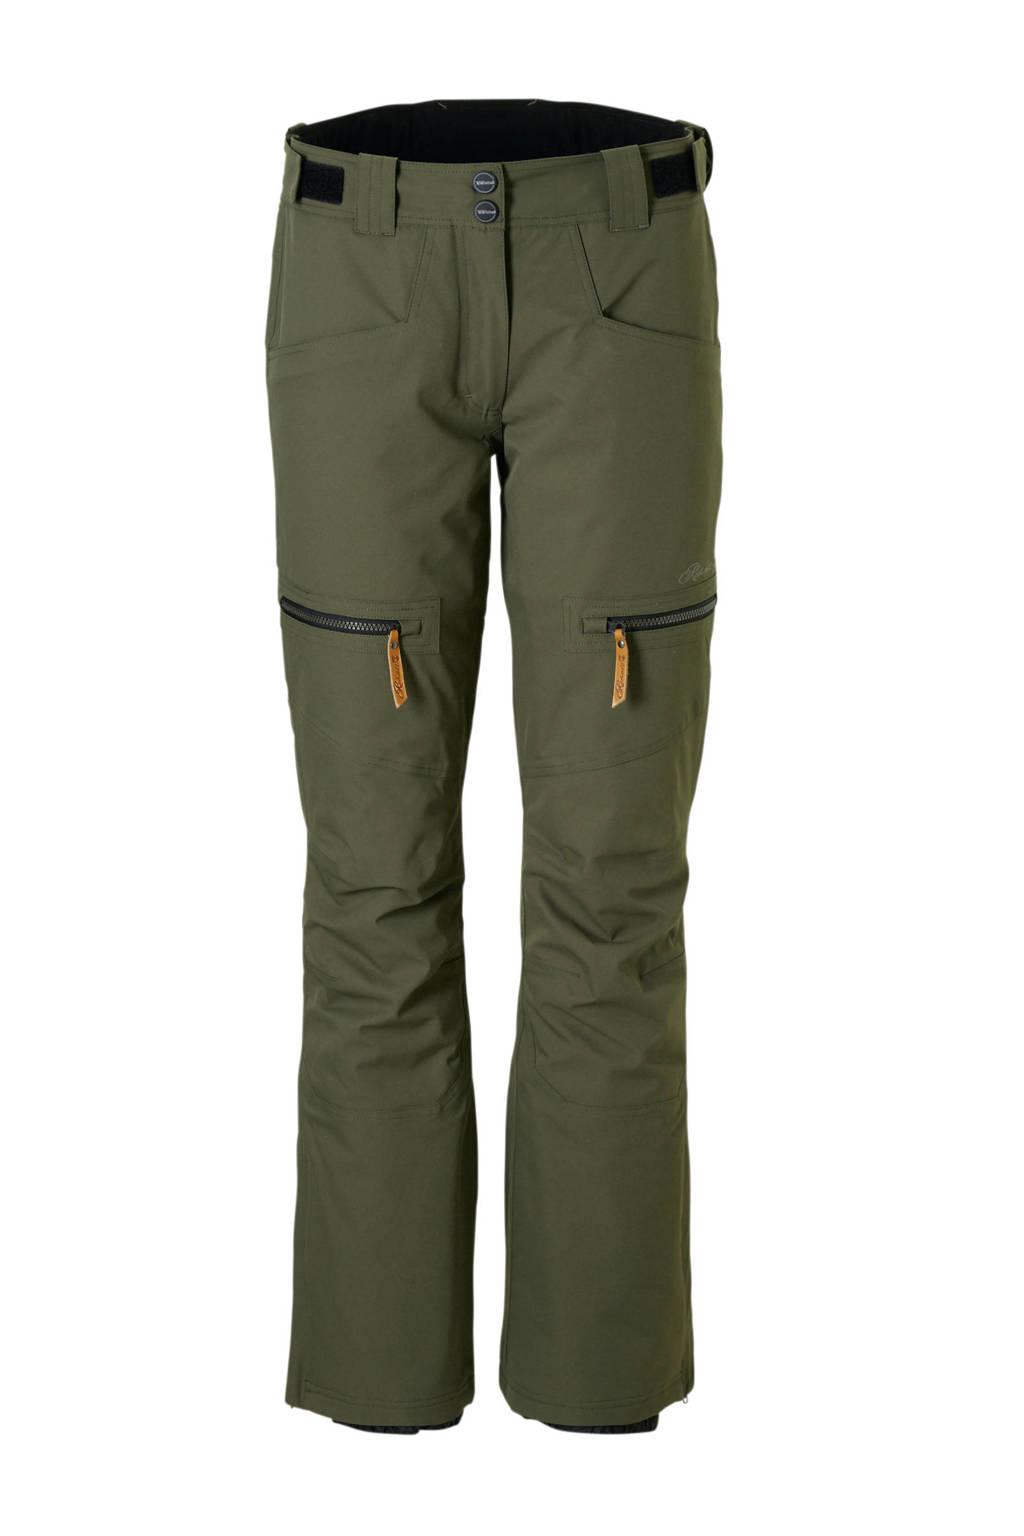 Rehall skibroek Harper-R groen, Donkergroen